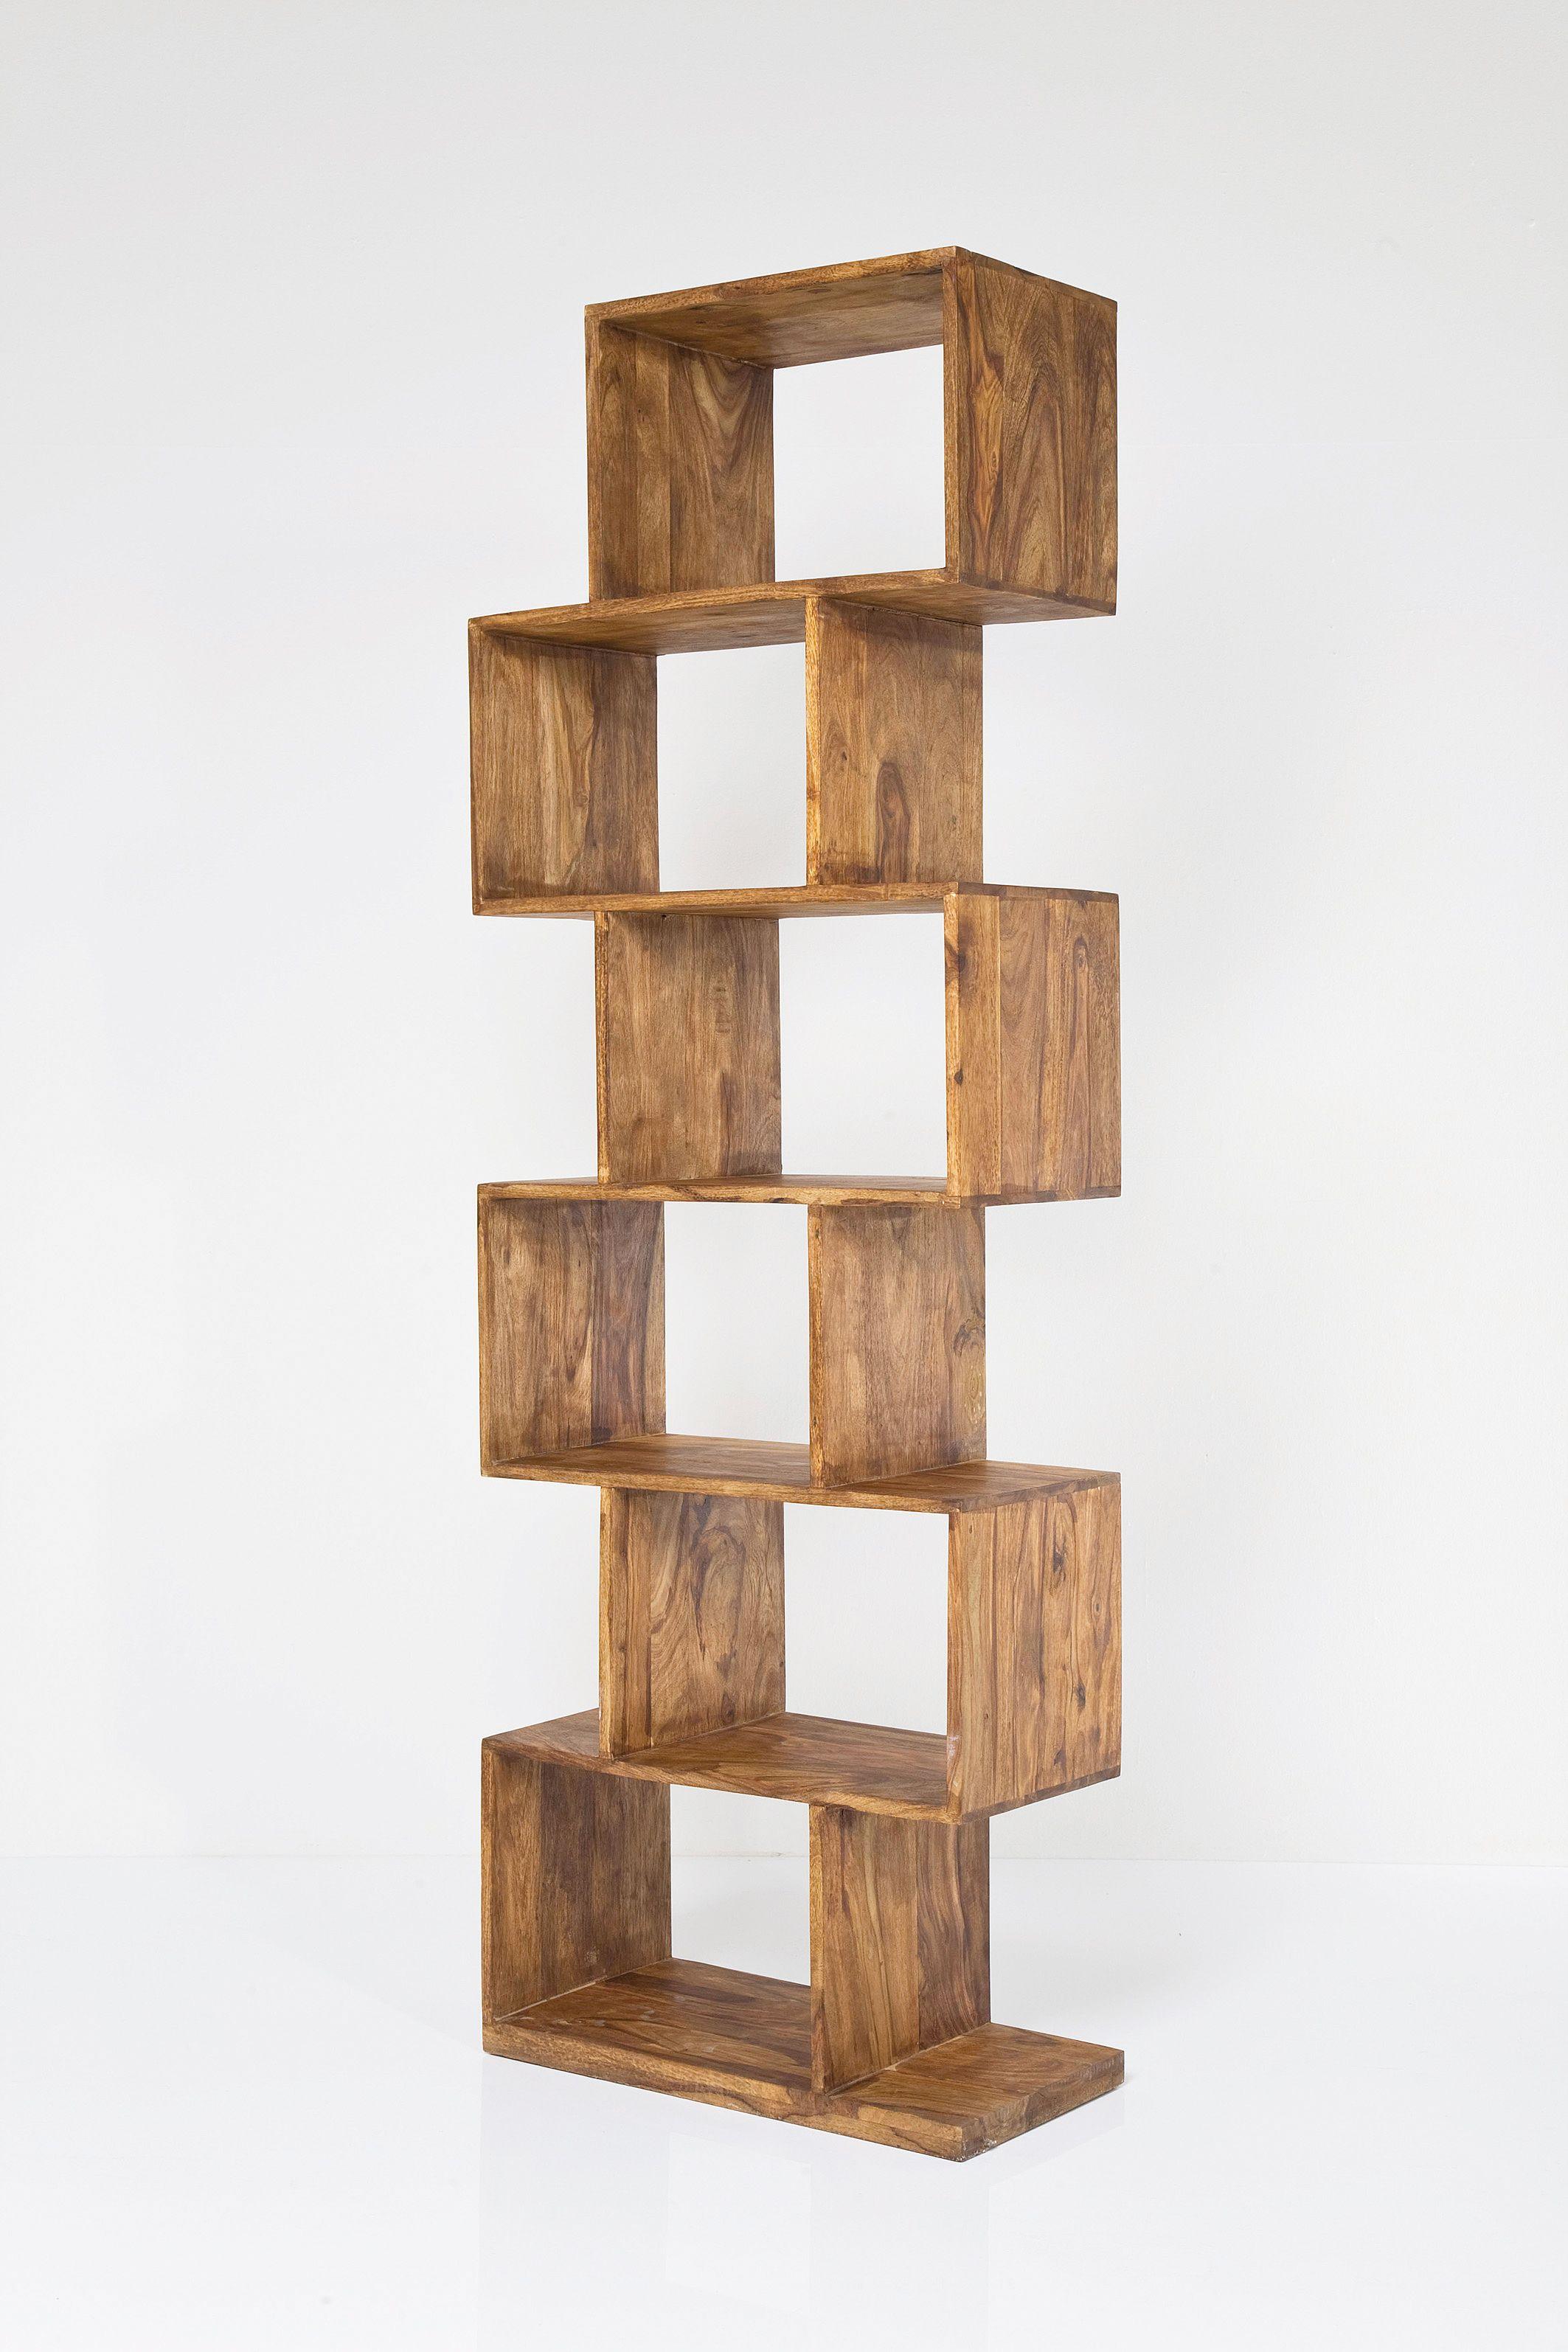 Kare Design Authentico Shelf Zig Zag Shelf Wood Furniture Http  # Muebles Don Bosco